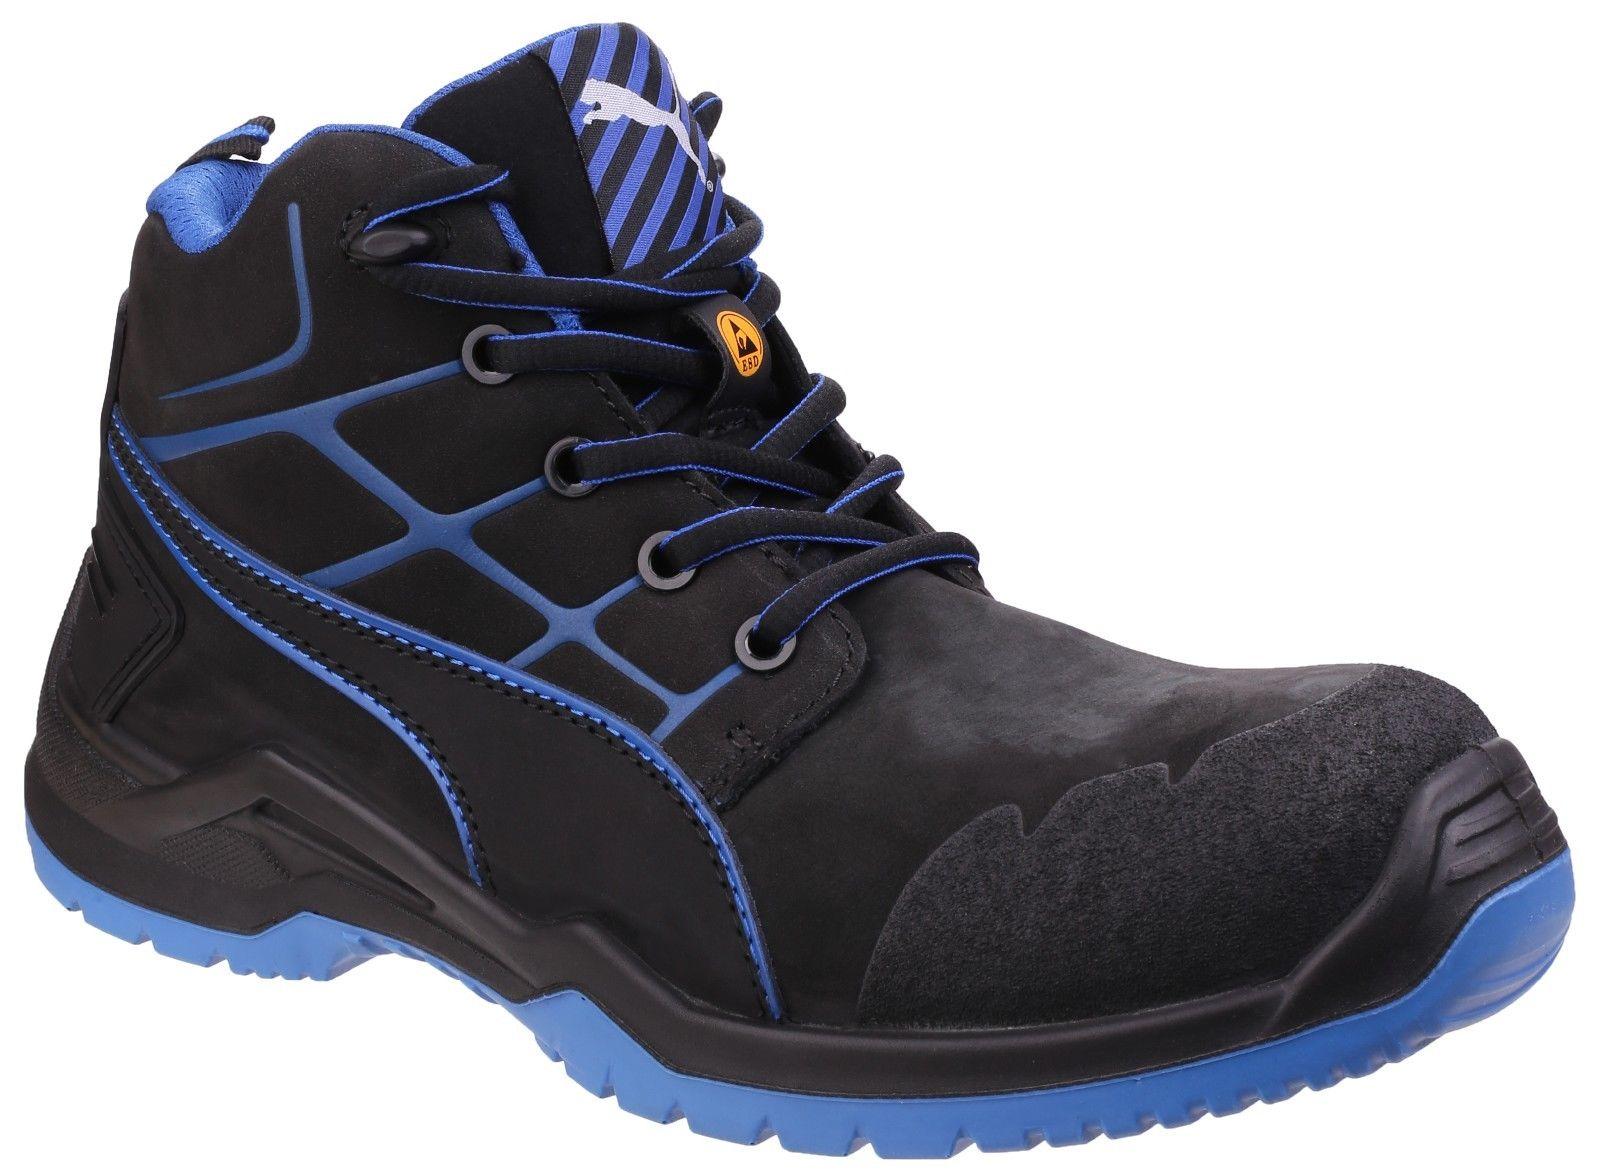 b7e5738d02407b Puma 634200 Krypton Blue Mid S3 ESD composite cop midsole safety boot 6.5-13